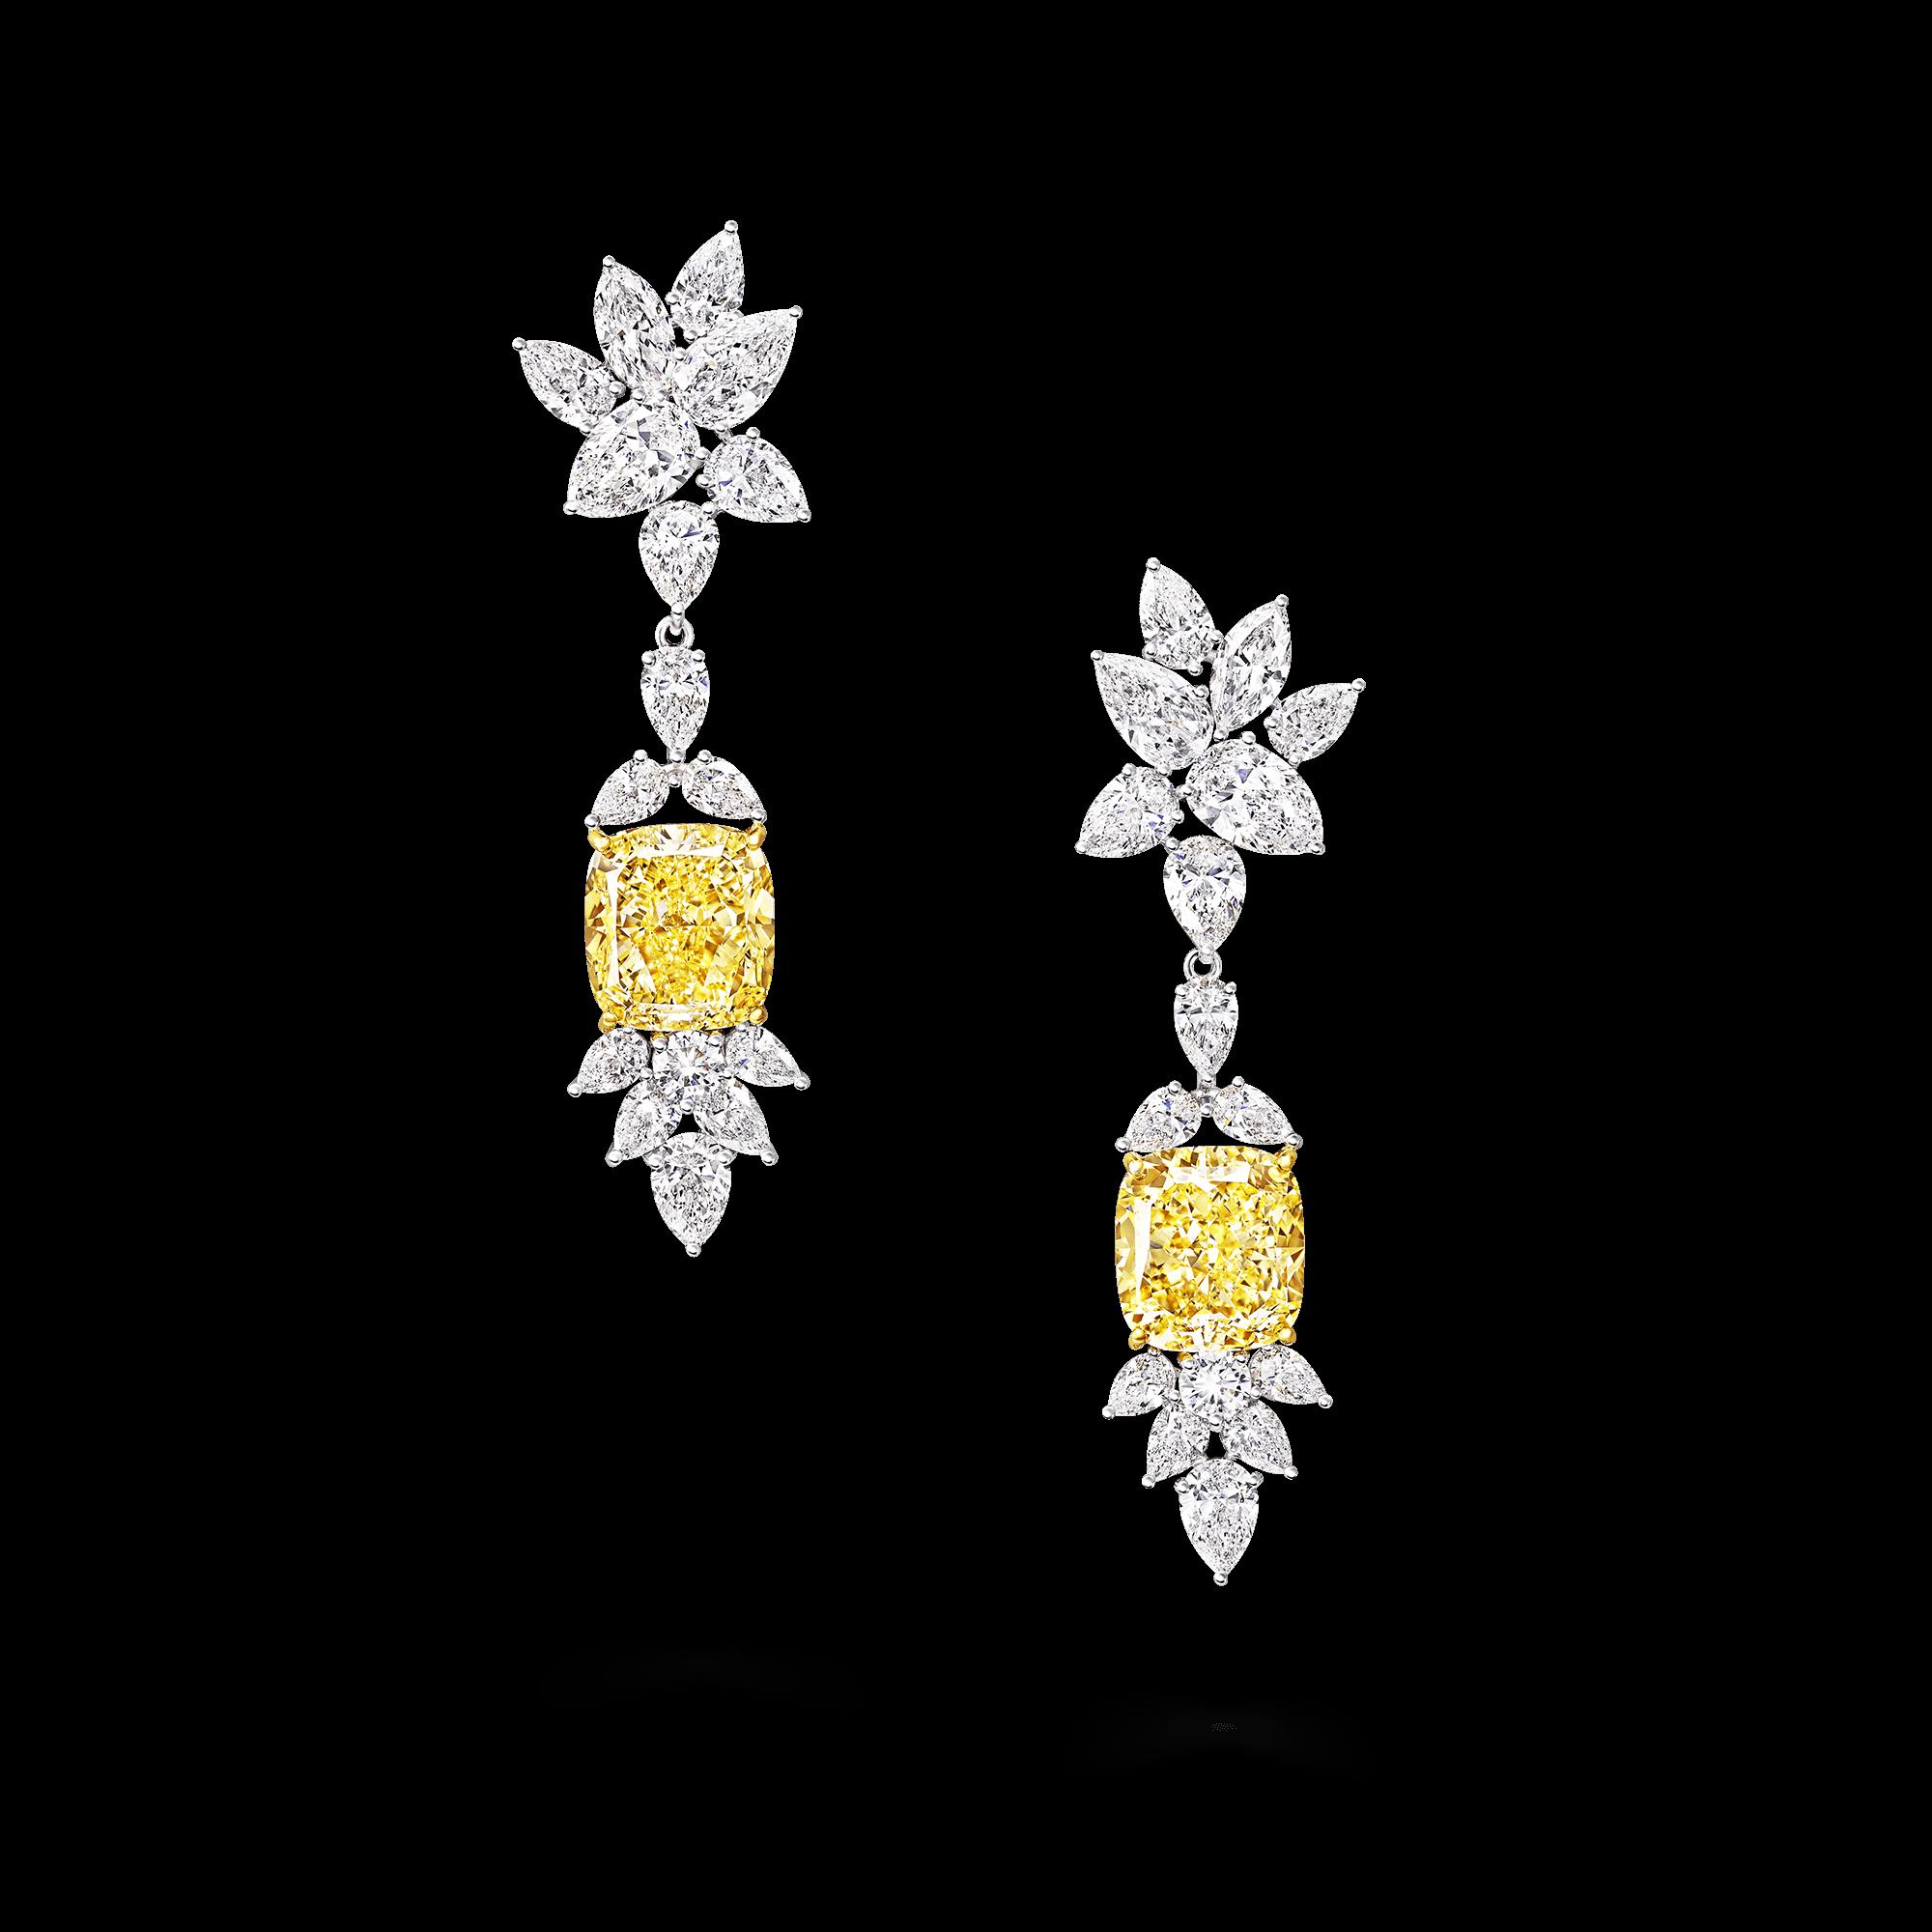 Graff Yellow Diamond High Jewellery A Yellow And White Diamond Earrings High Jewelry Yellow Diamond Yellow Diamond Earring